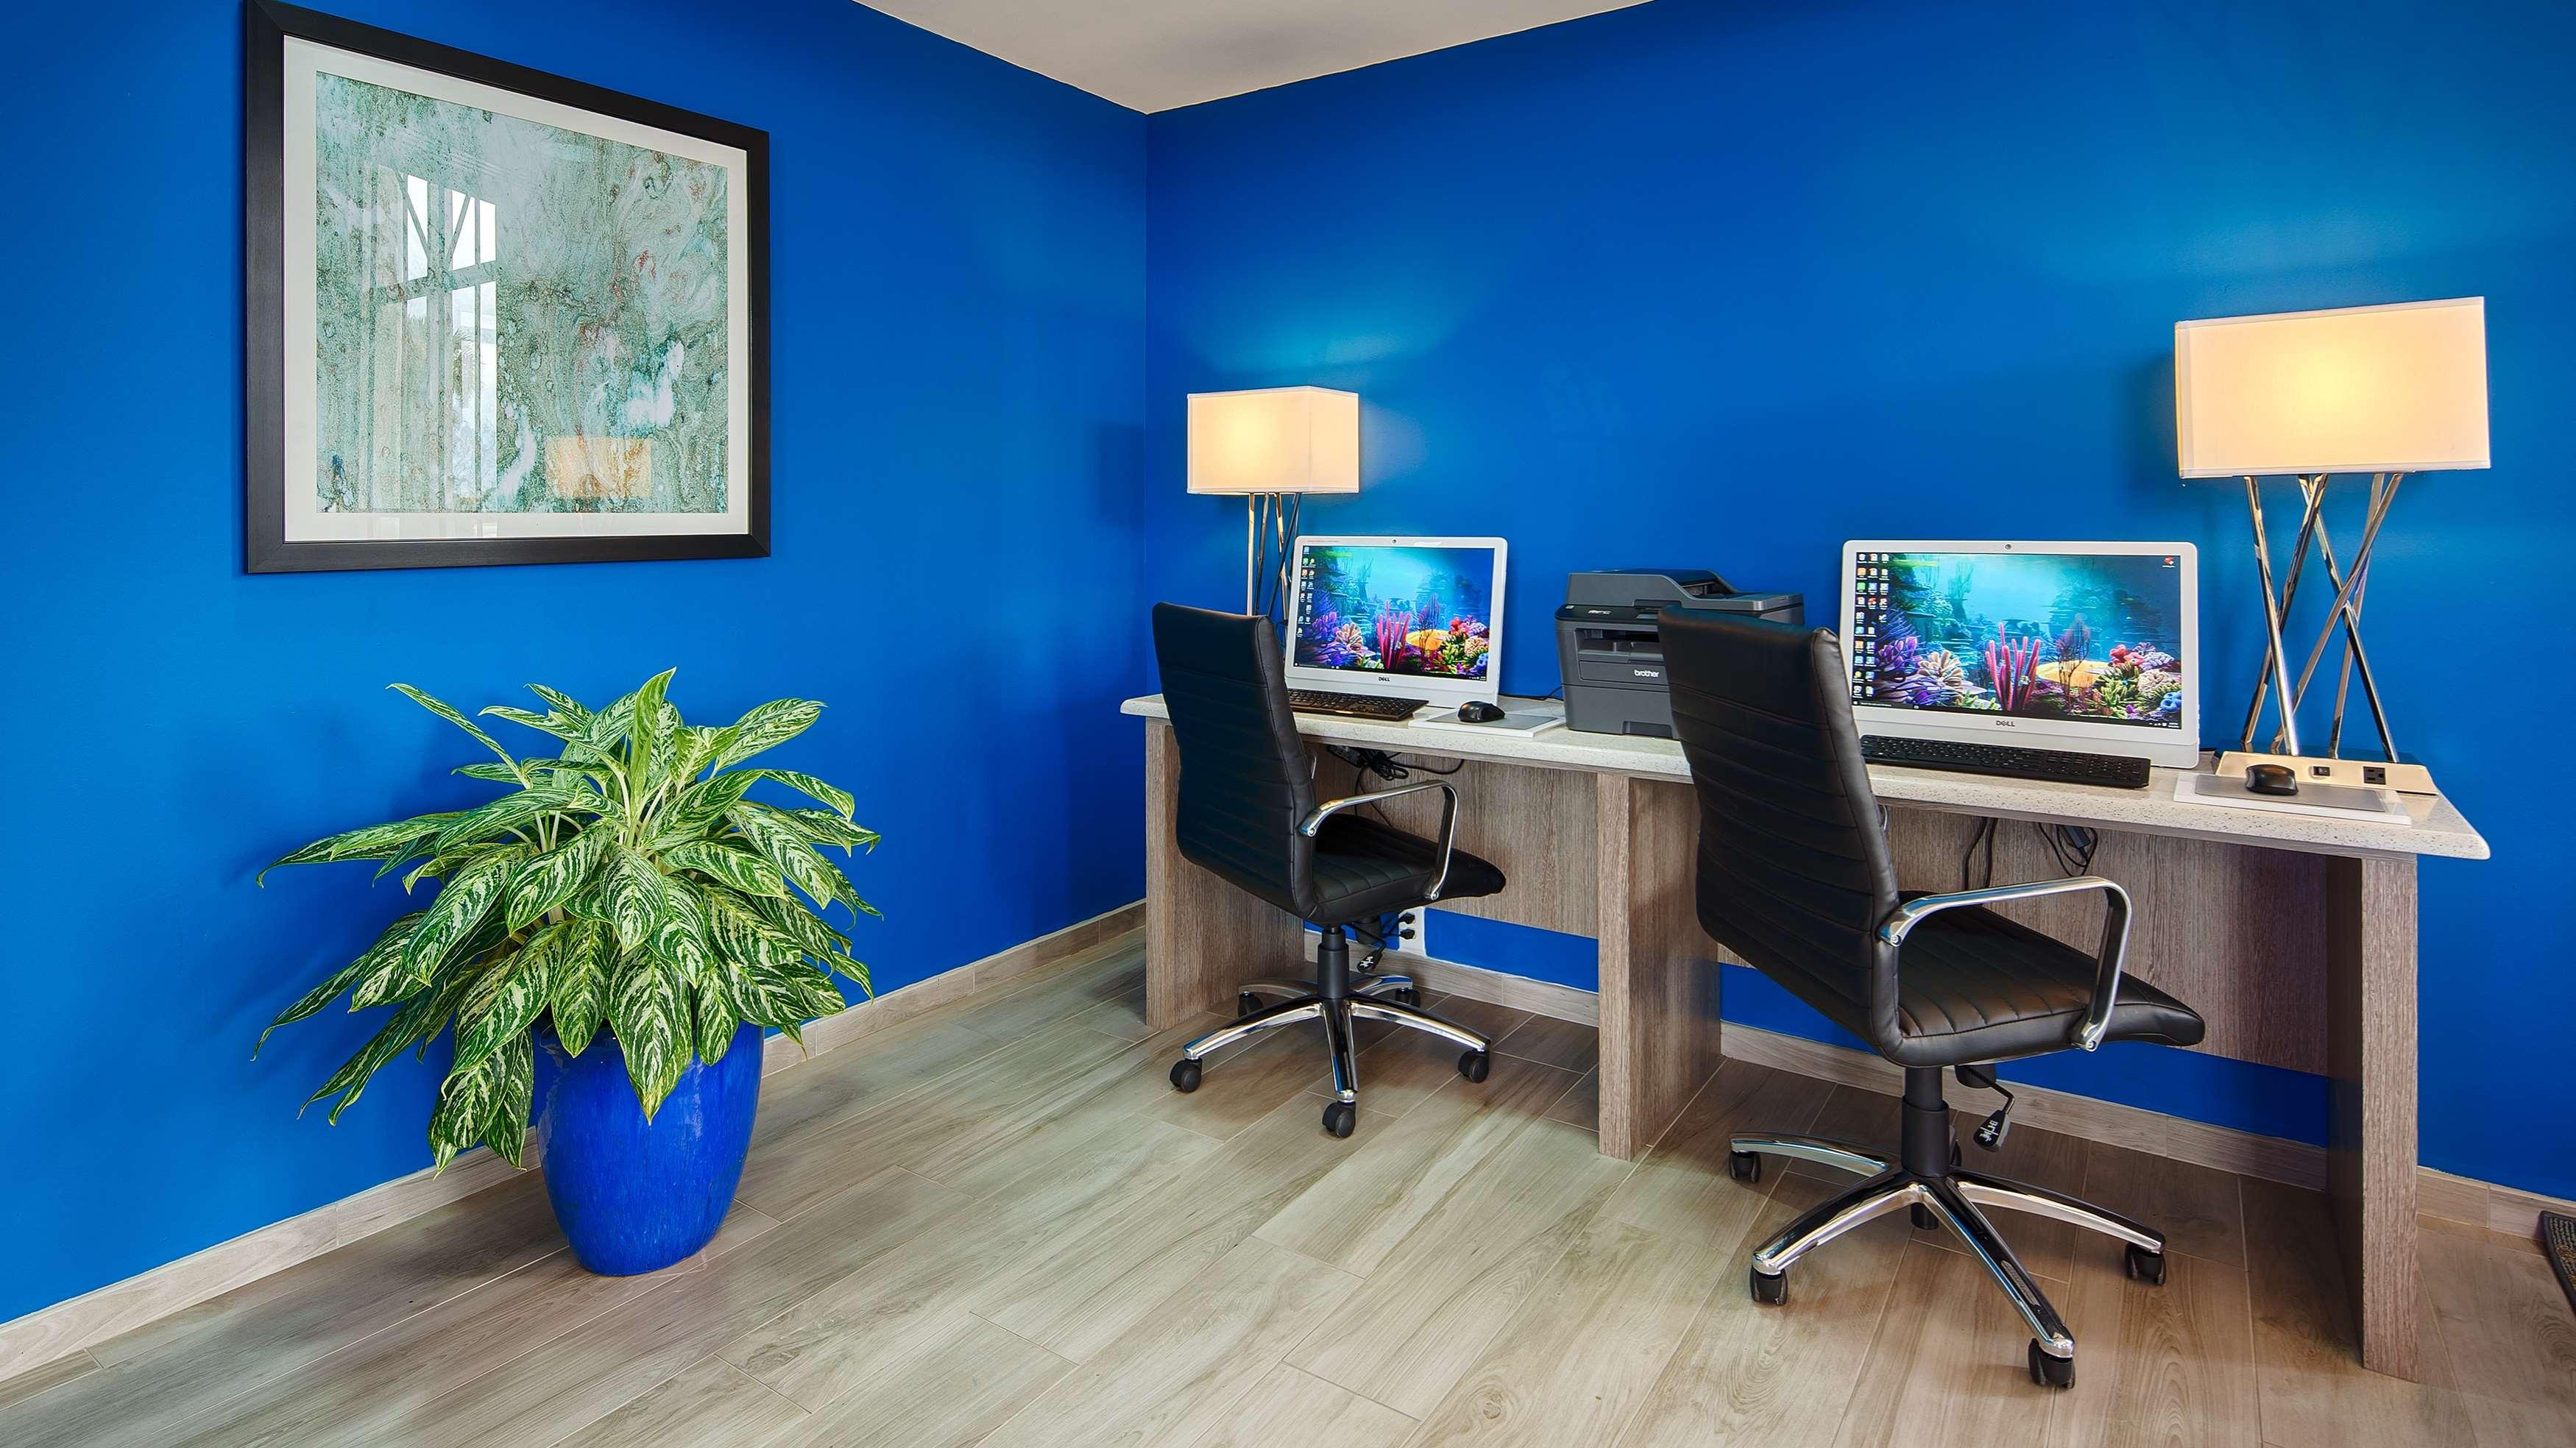 Best Western Fort Myers Inn & Suites image 8